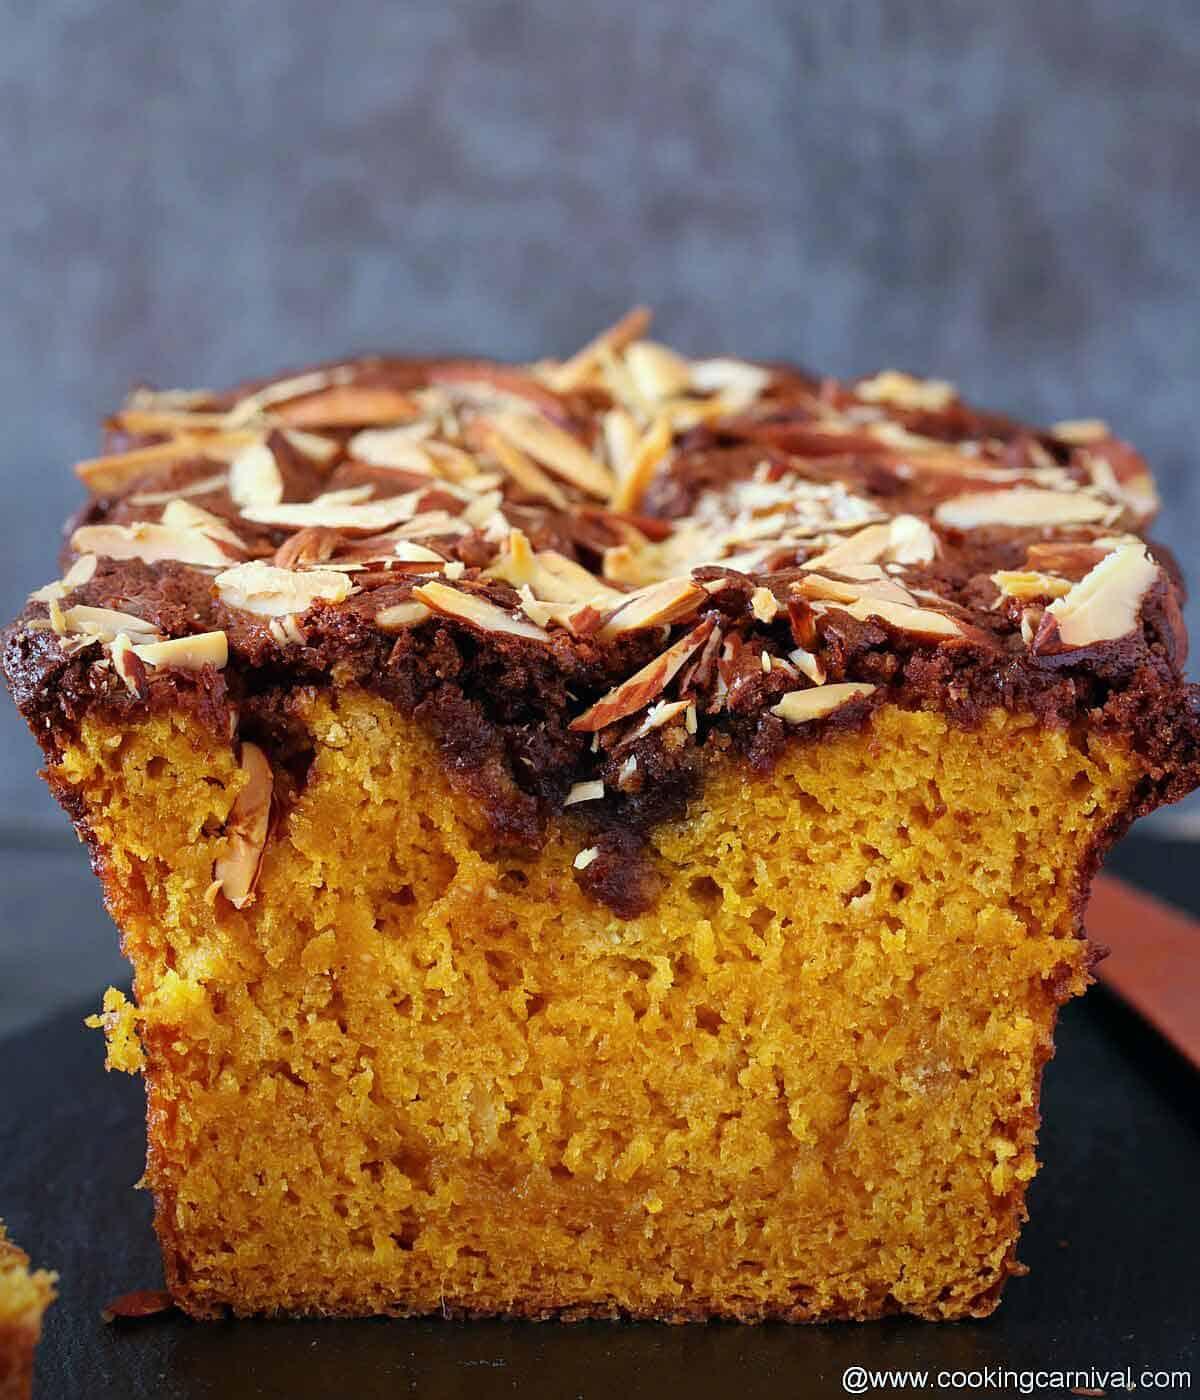 pic showing inside of mango loaf cake